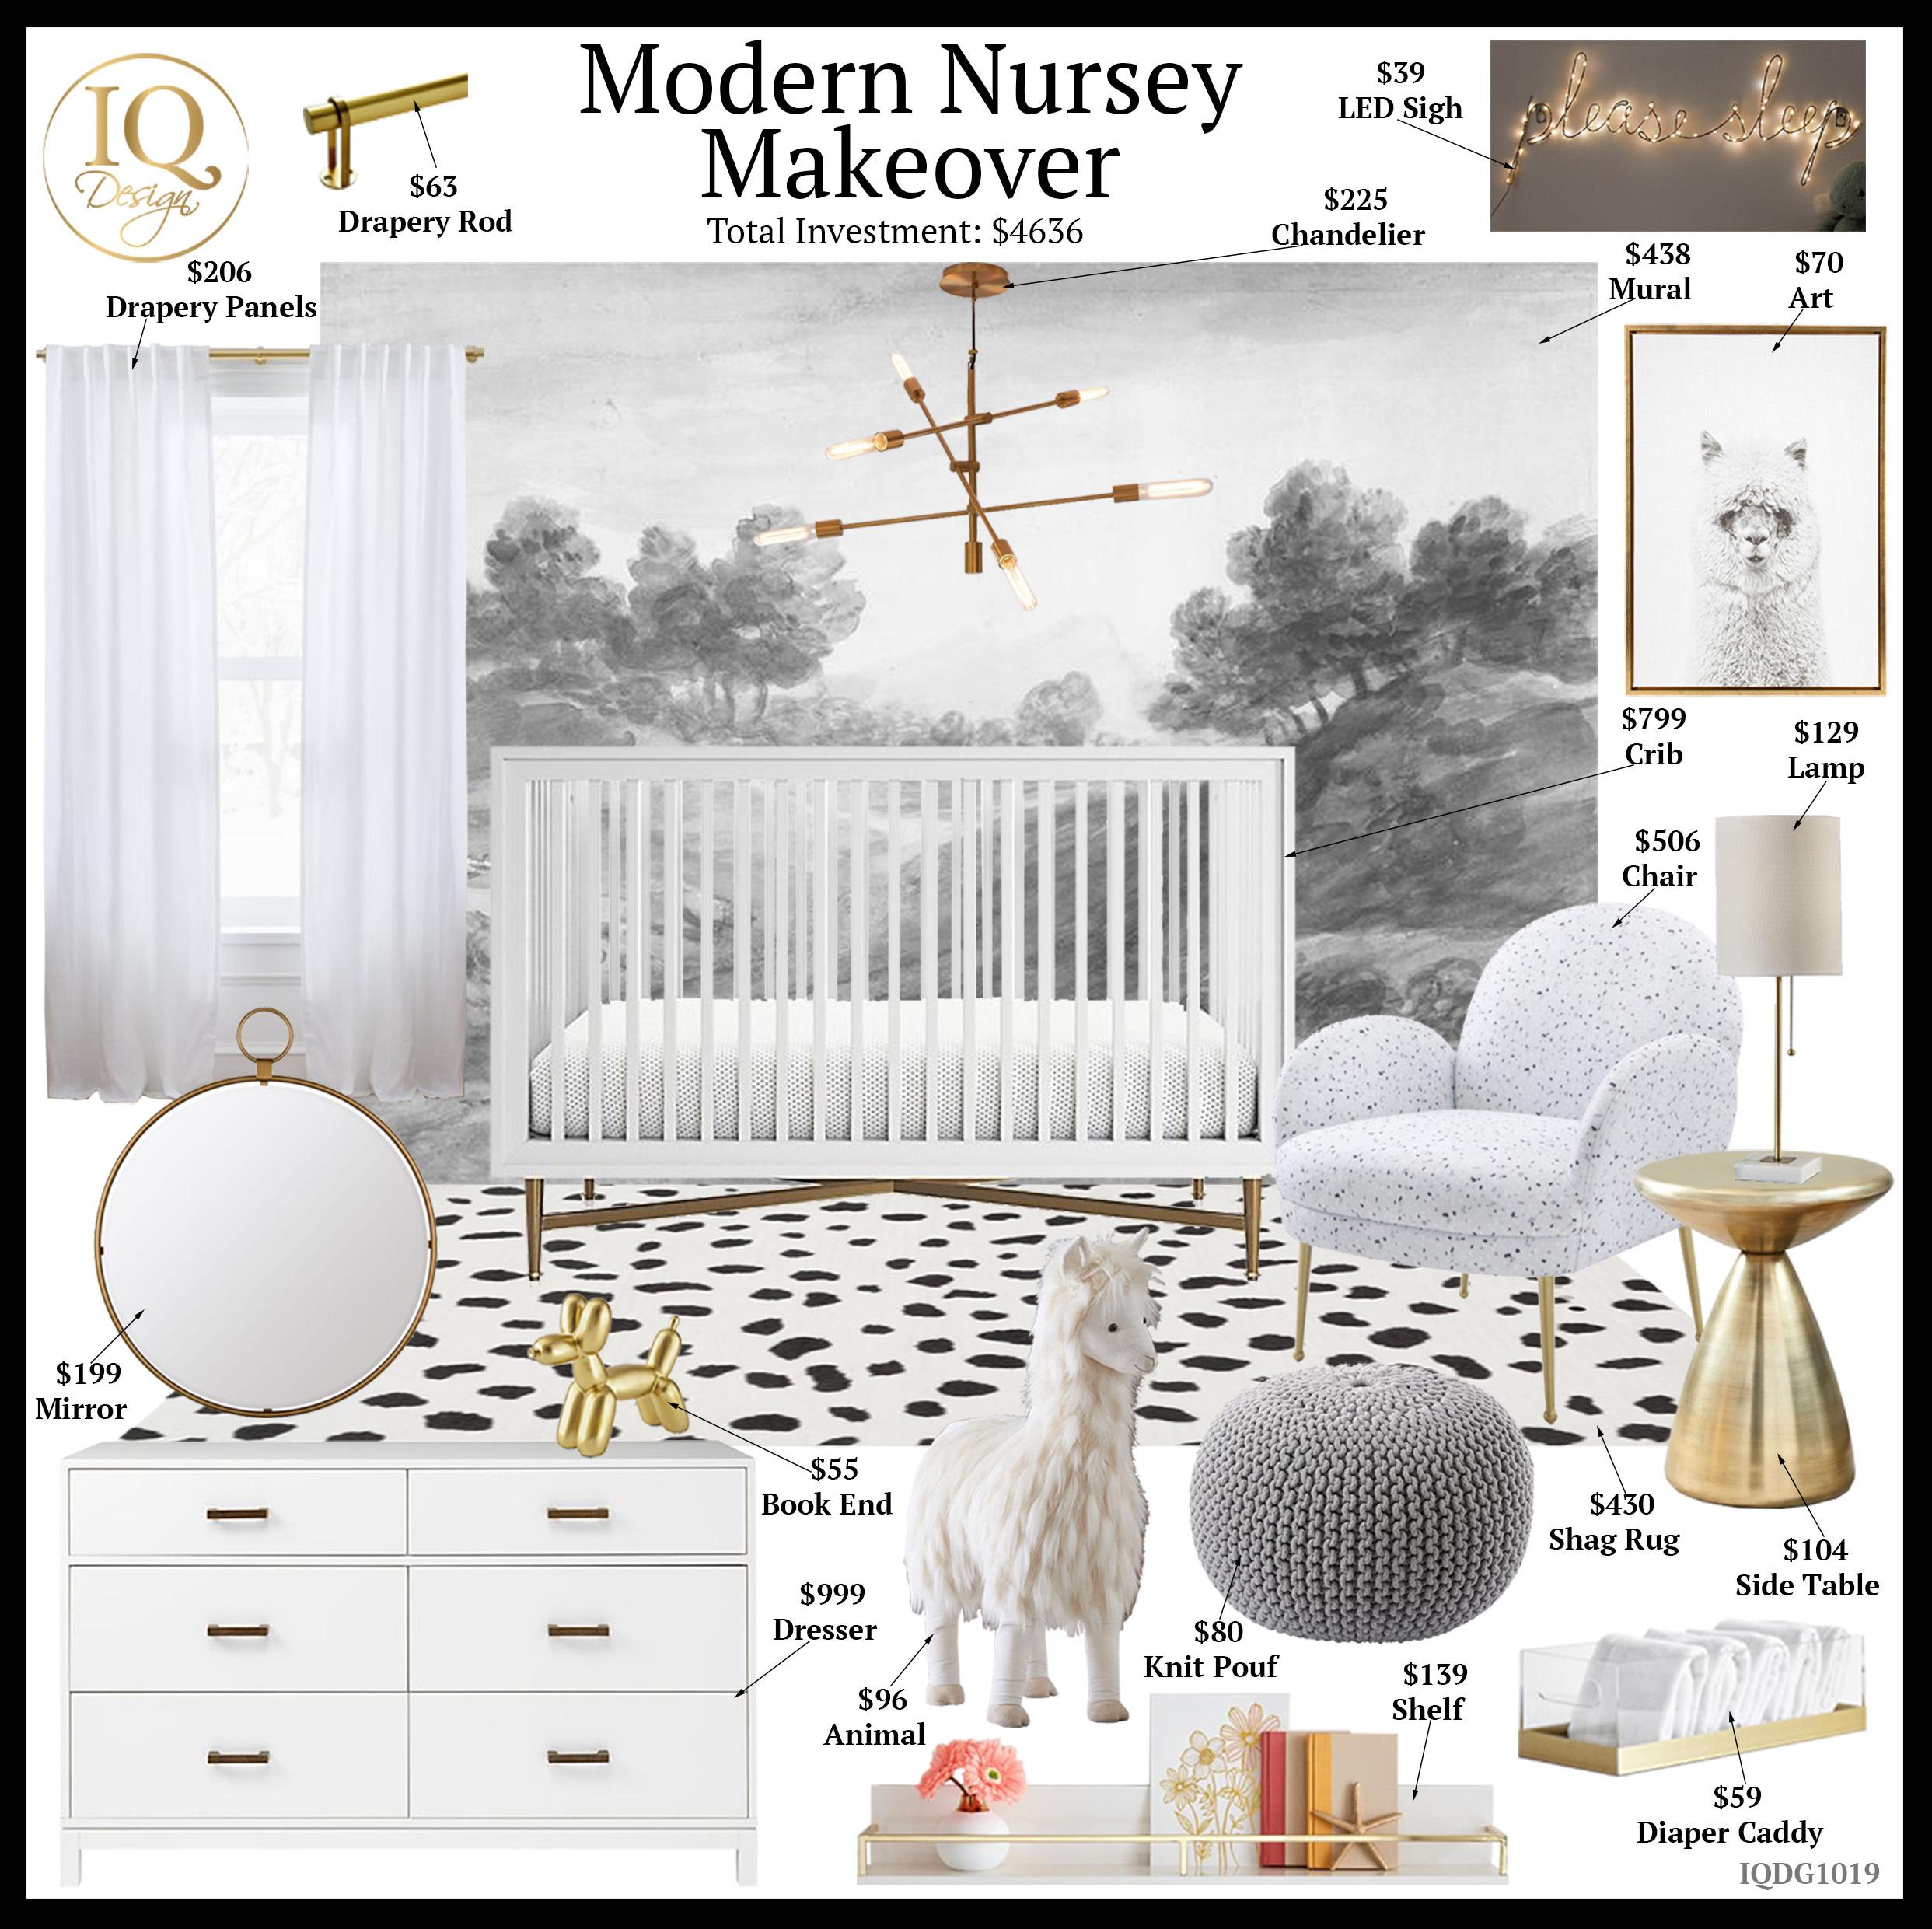 IQDG1019_K BW Nursery MakeoverHR.jpg